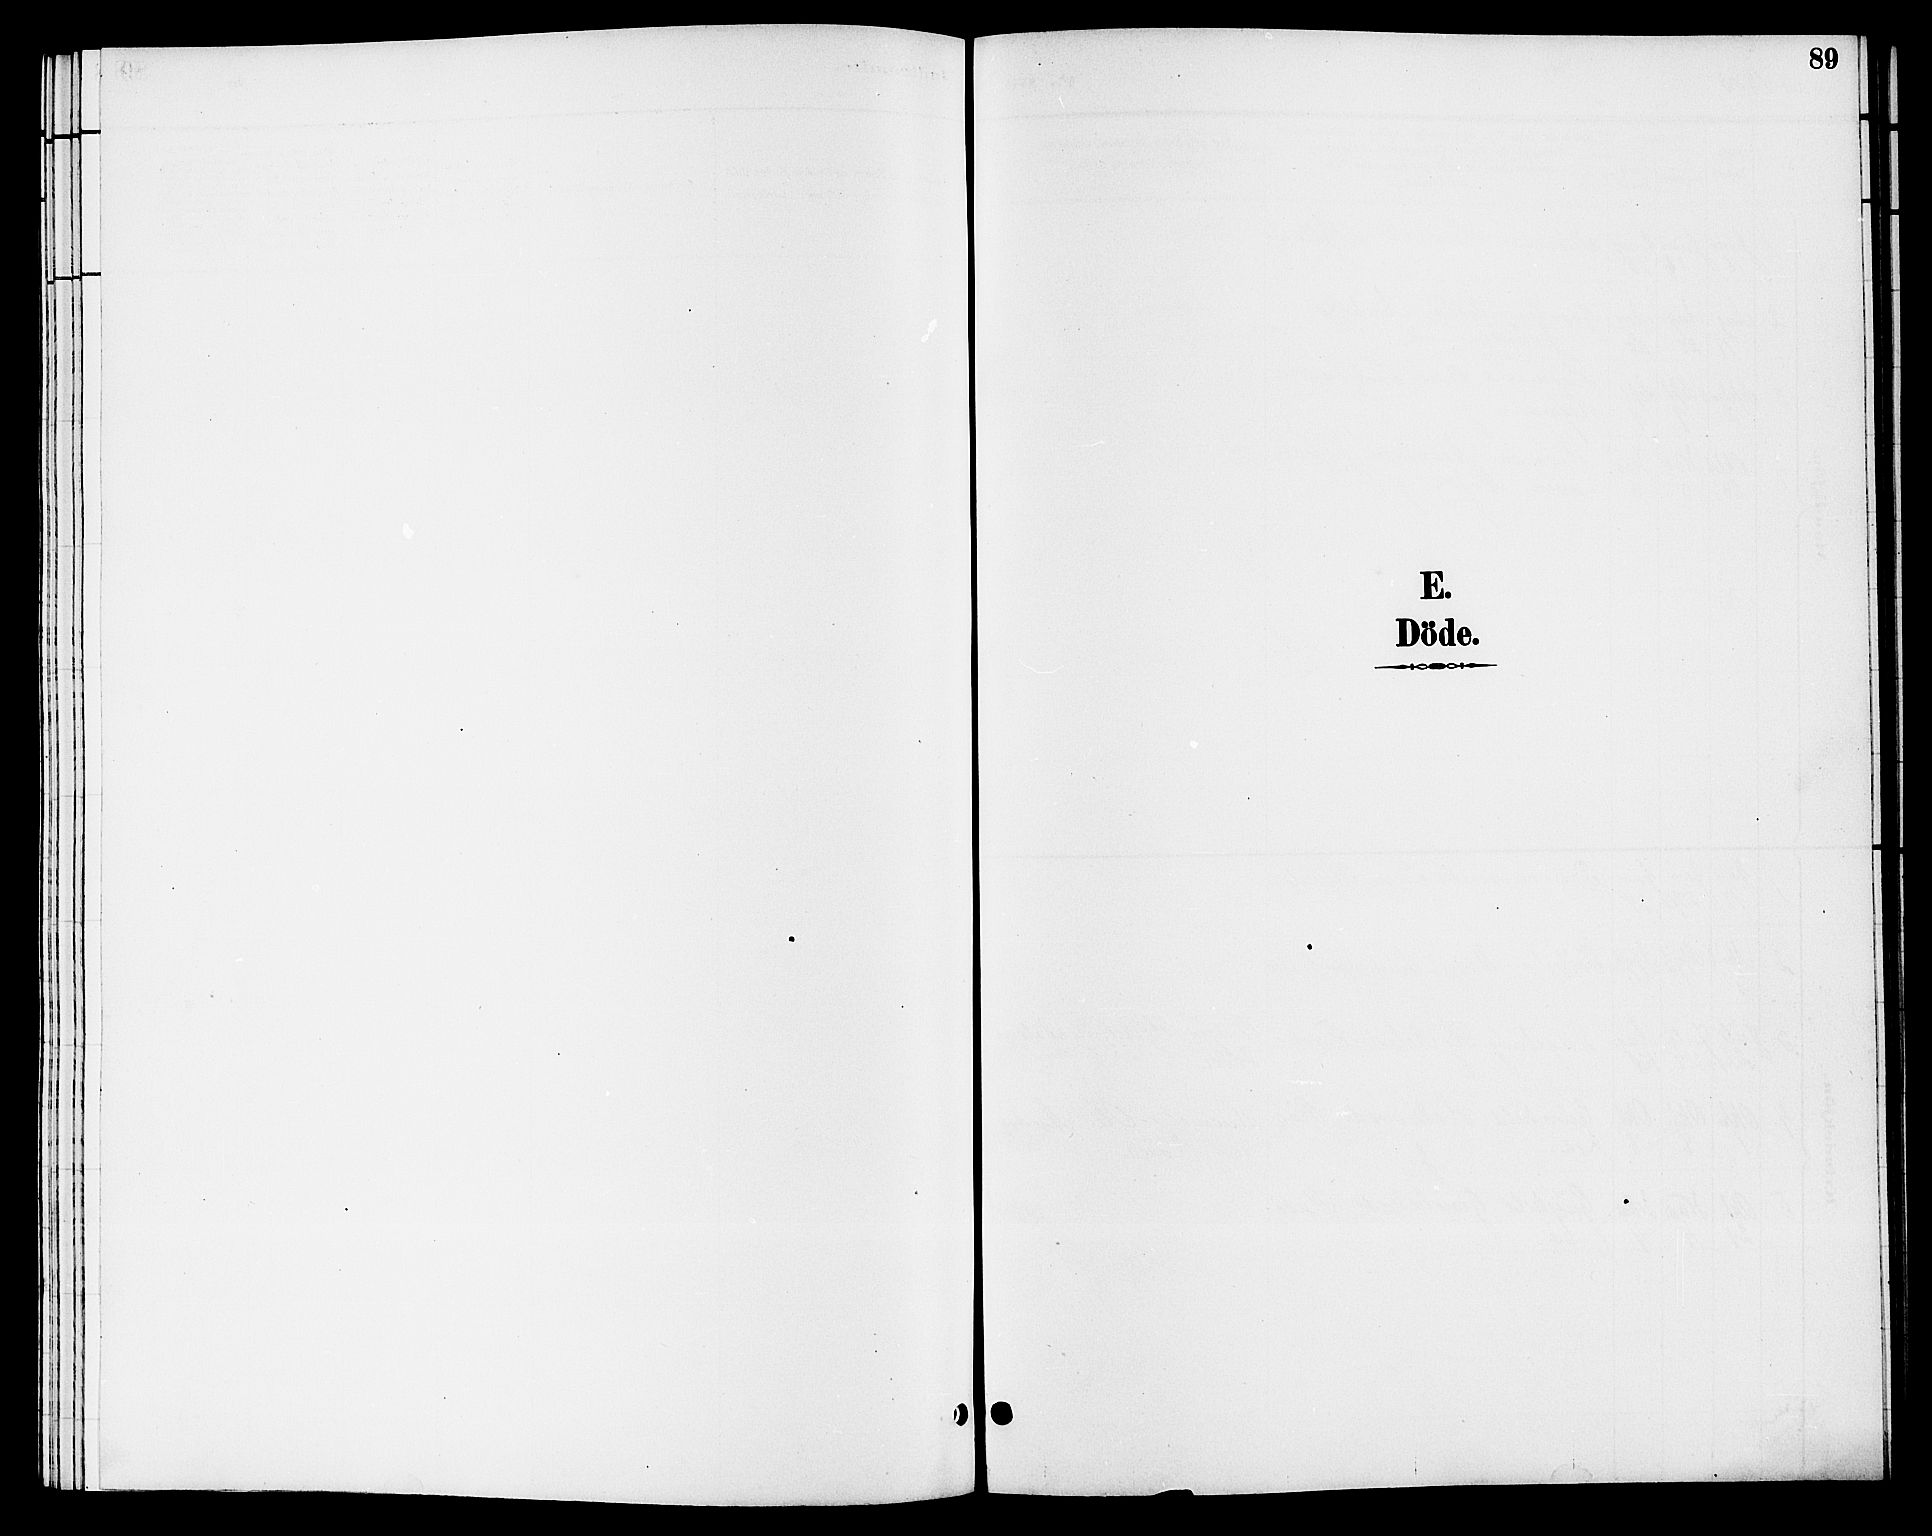 SAKO, Hjartdal kirkebøker, G/Gb/L0003: Klokkerbok nr. II 3, 1884-1899, s. 89